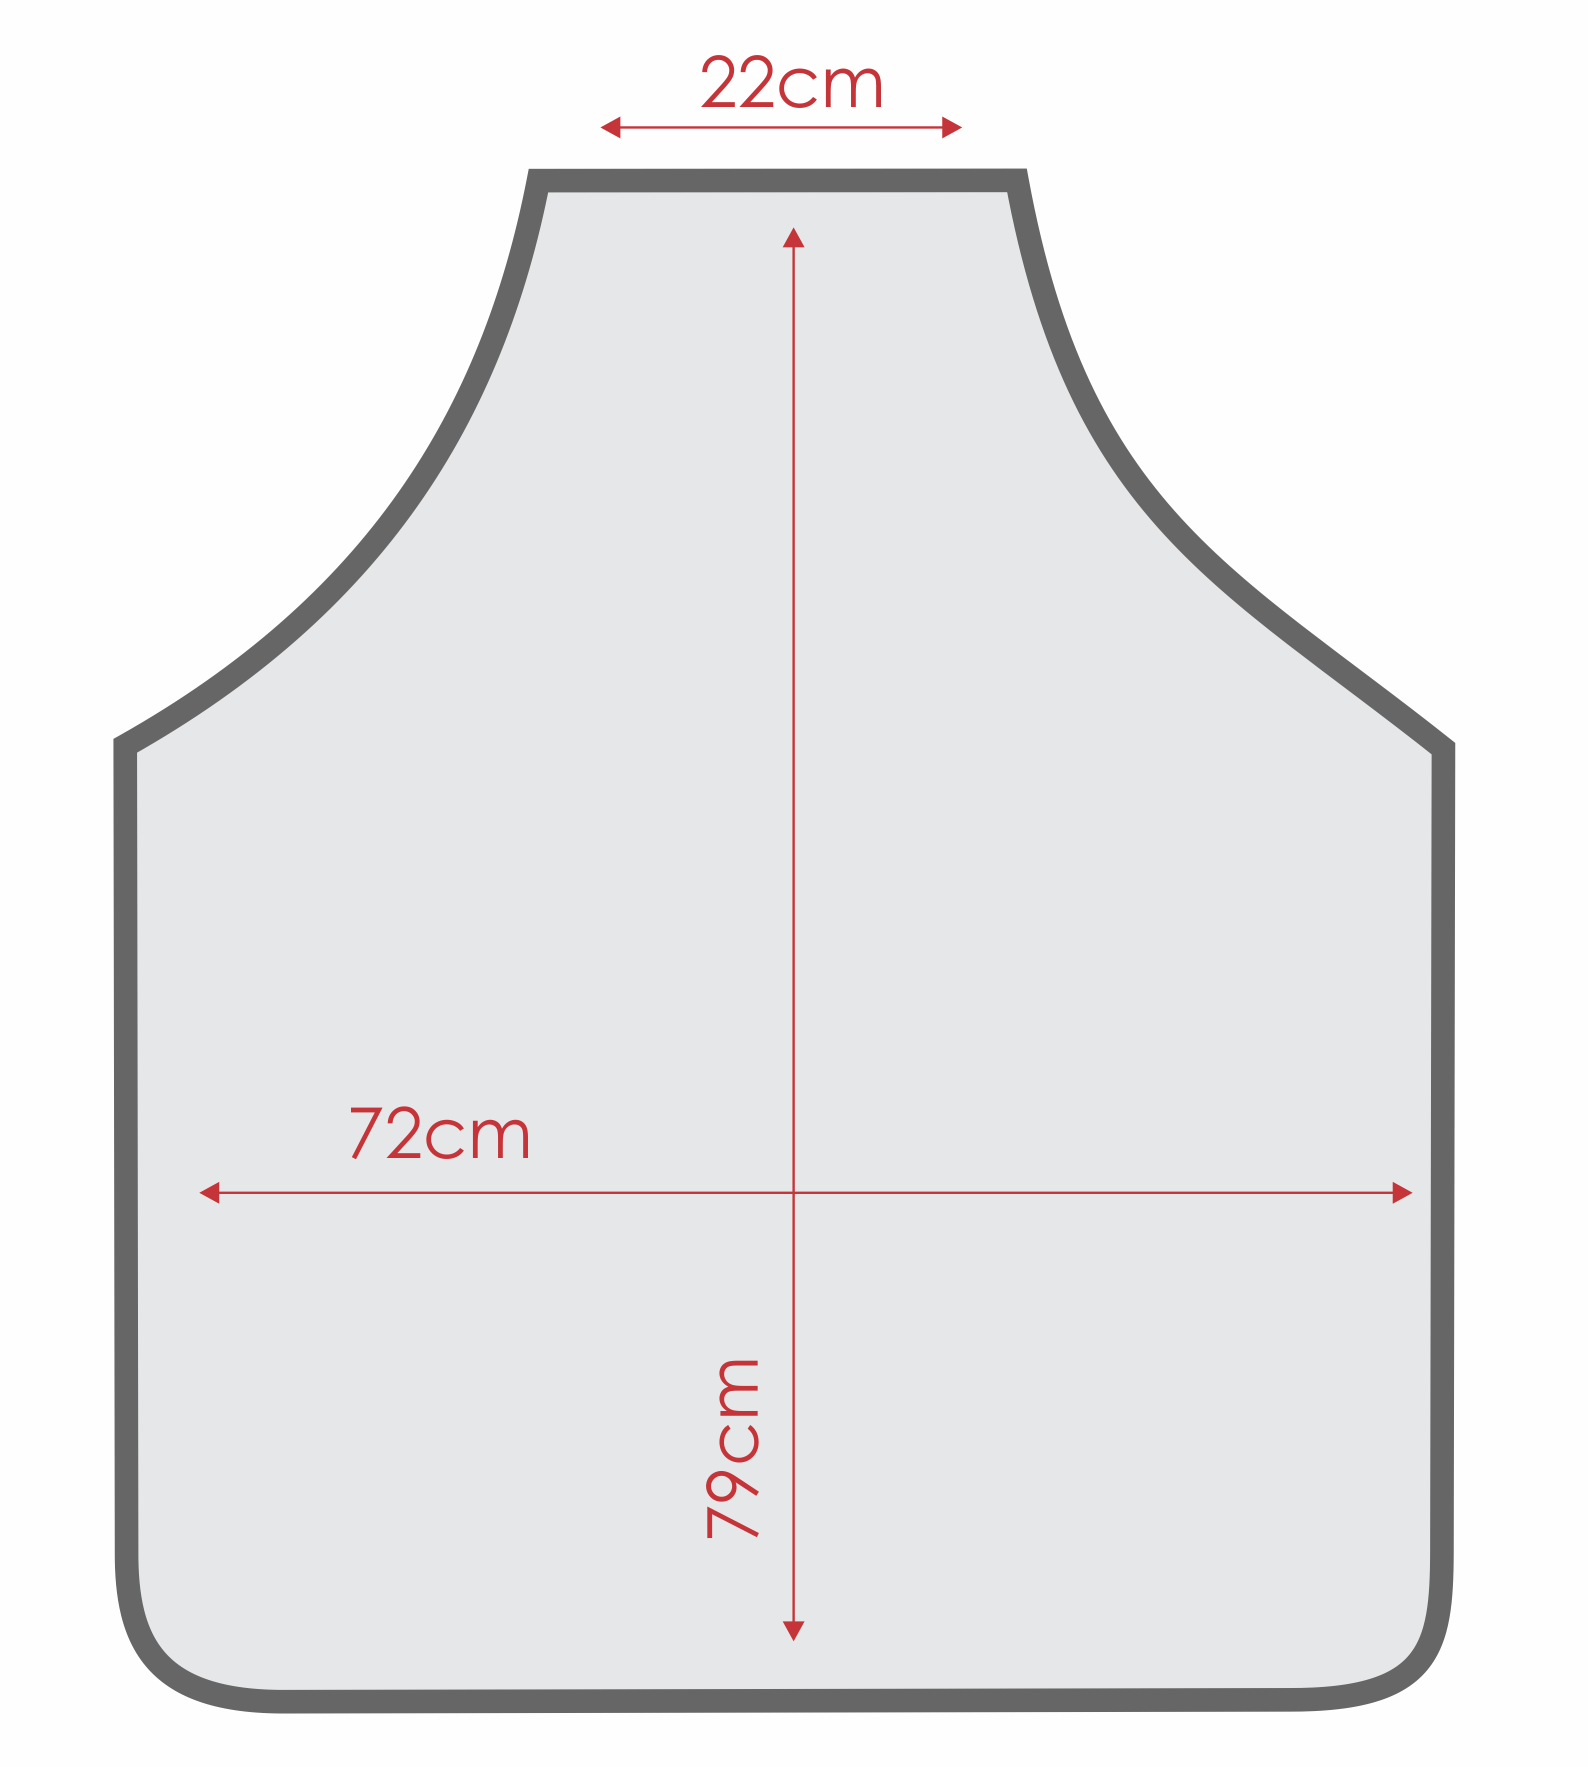 Avental Liso Oxford Branco - Tamanho Grande  - RECANTO DA COSTURA